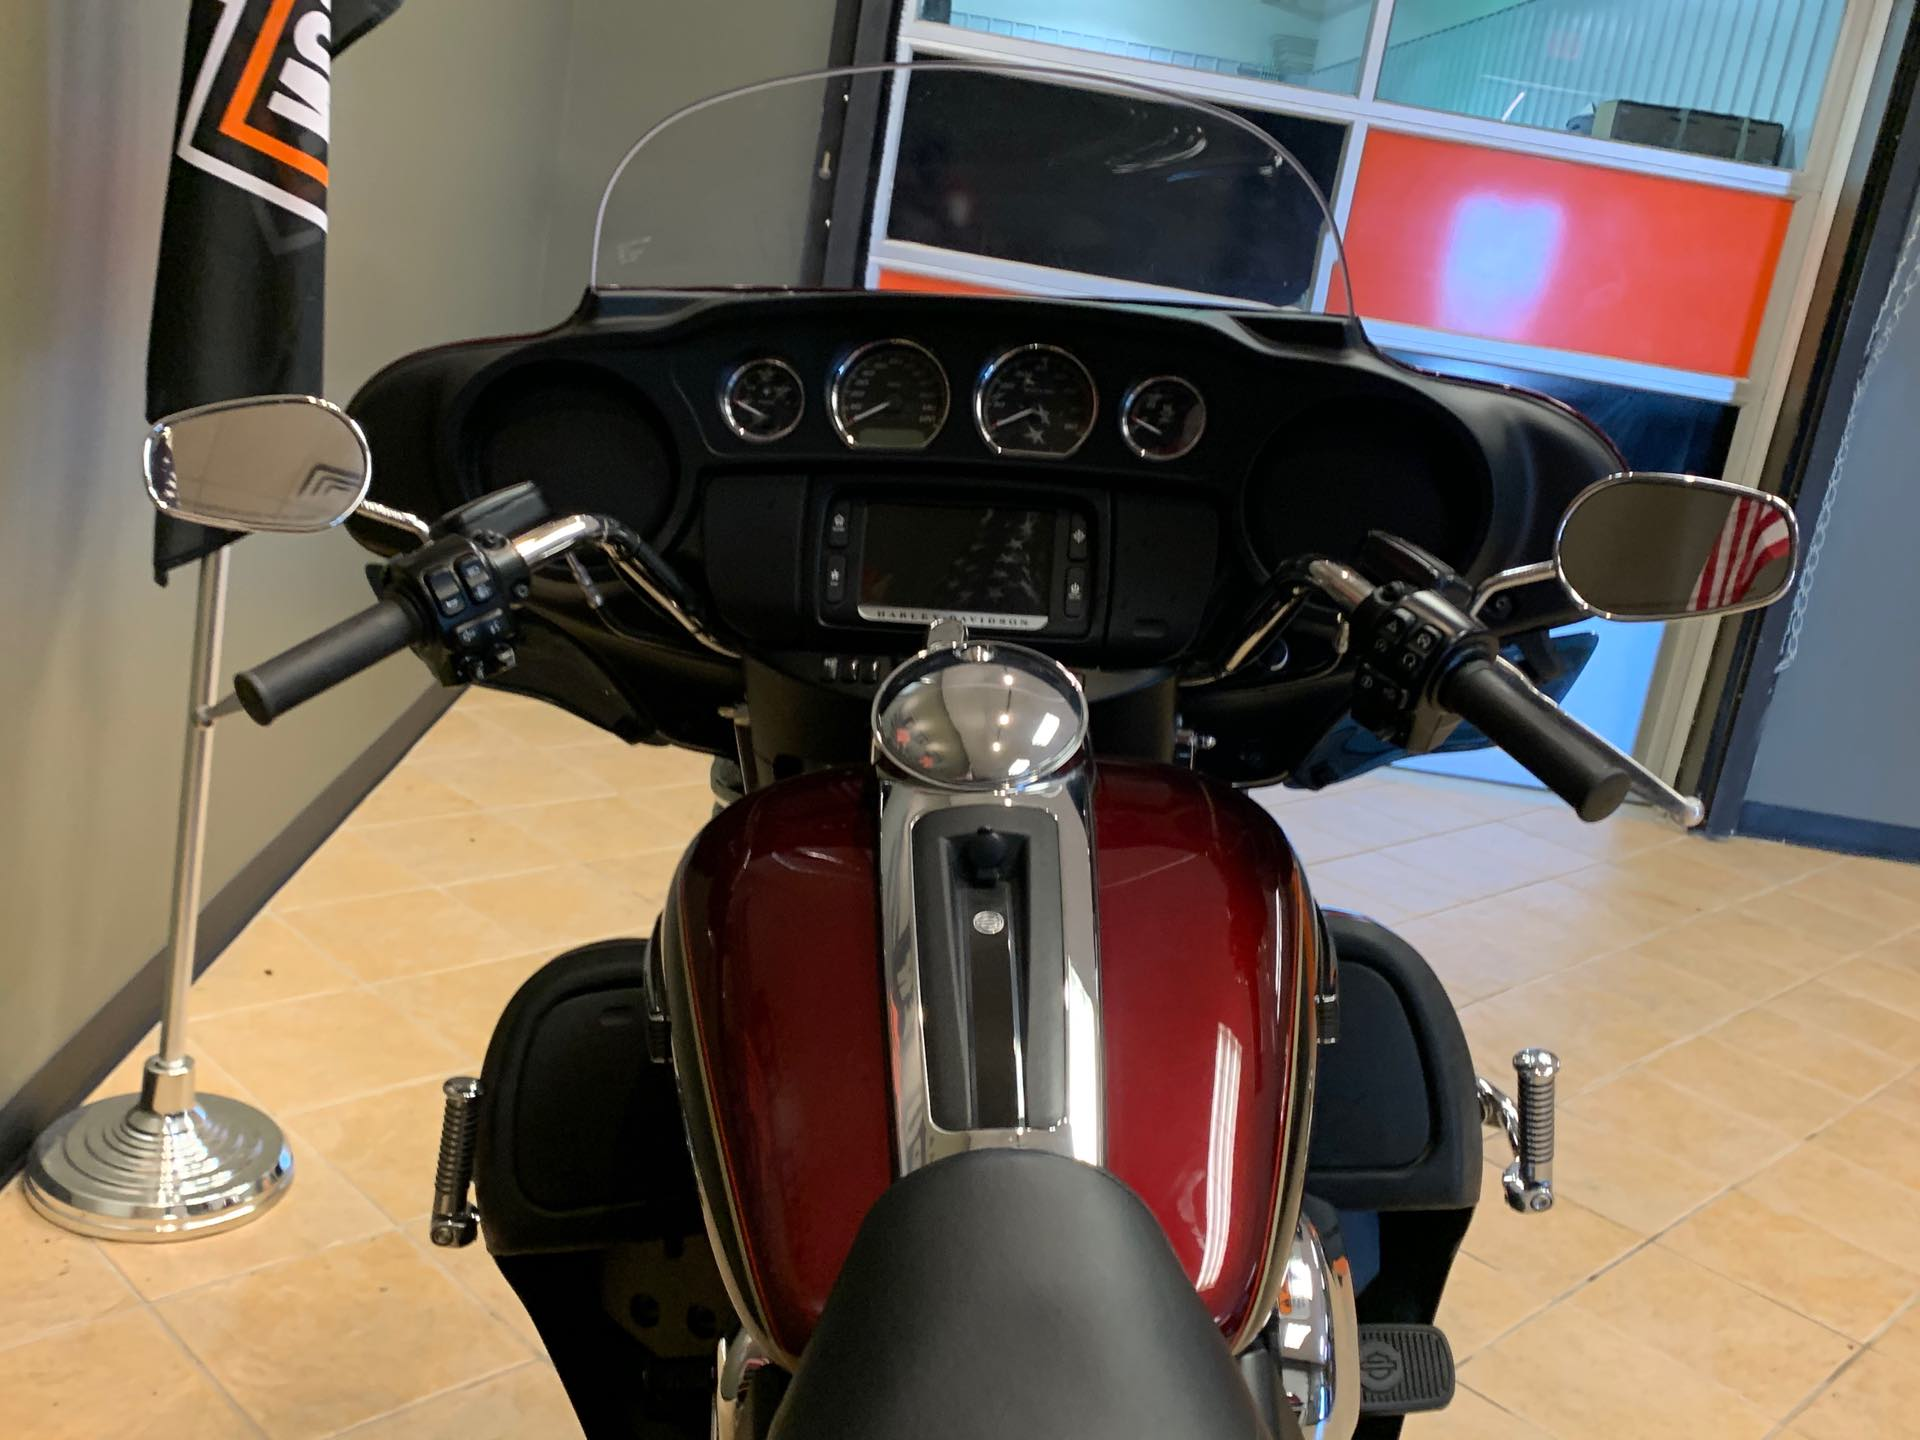 2015 Harley-Davidson Electra Glide Ultra Classic Low at Loess Hills Harley-Davidson